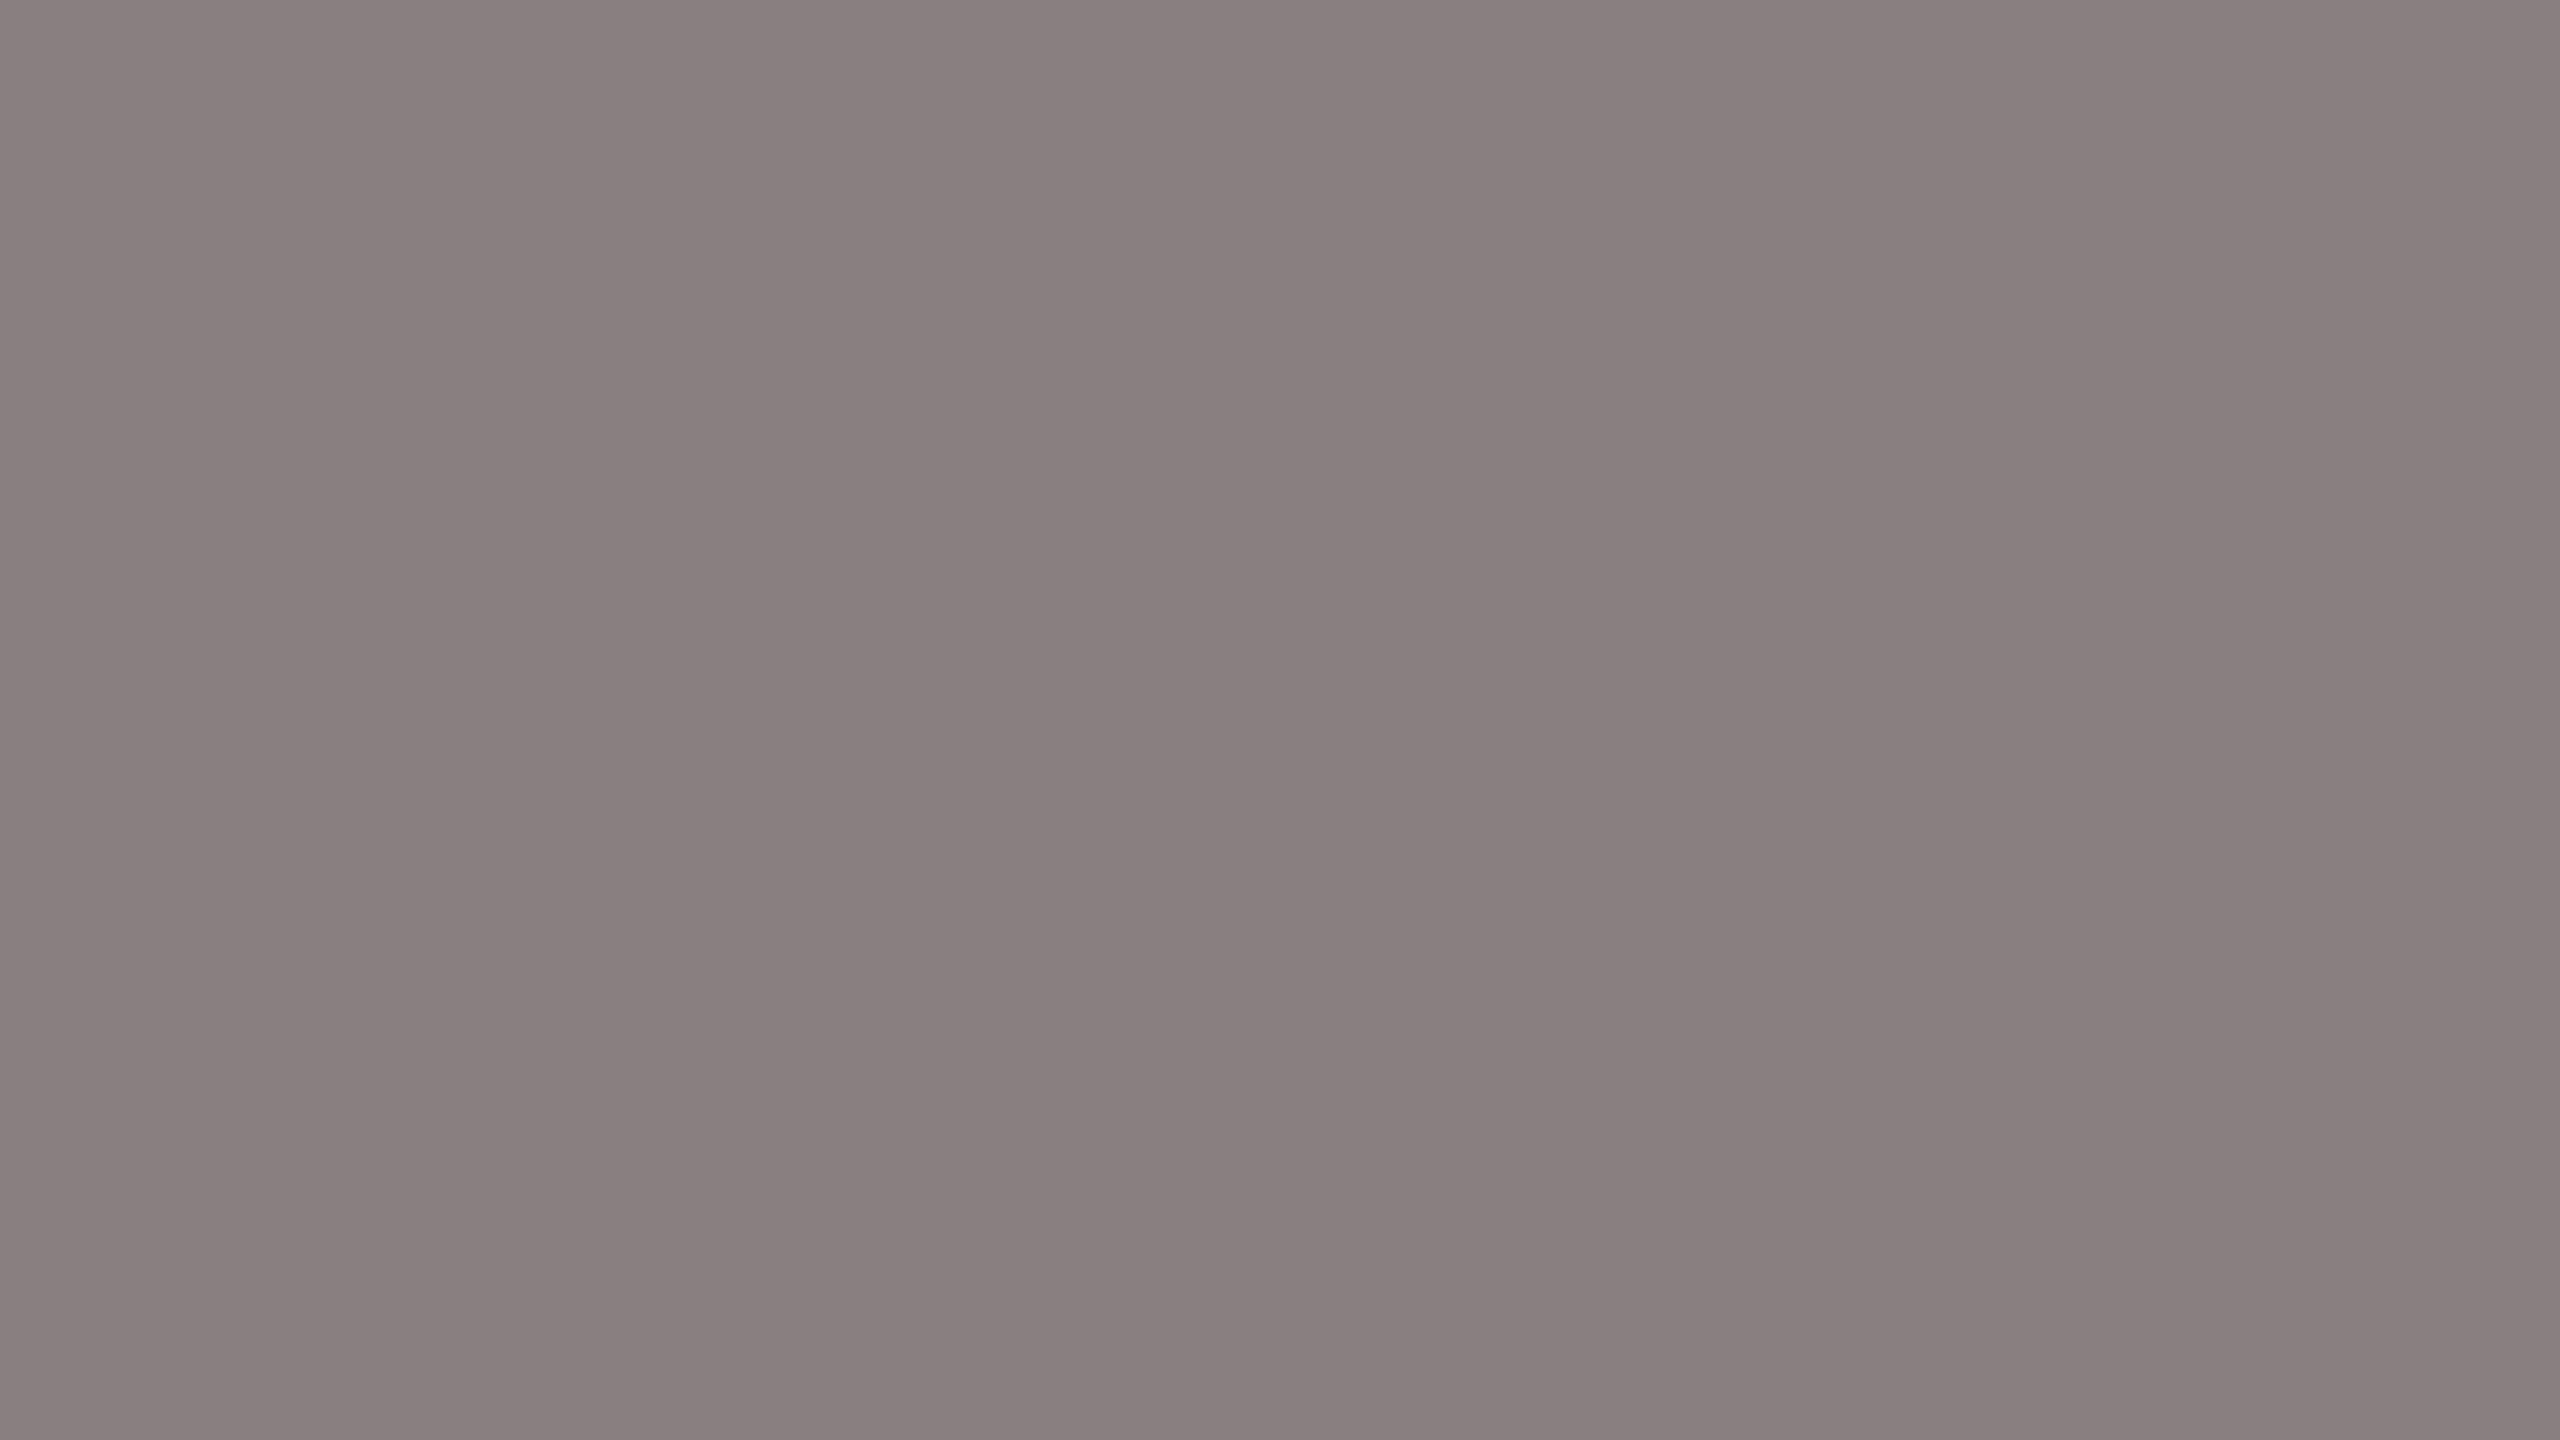 2560x1440 Rocket Metallic Solid Color Background